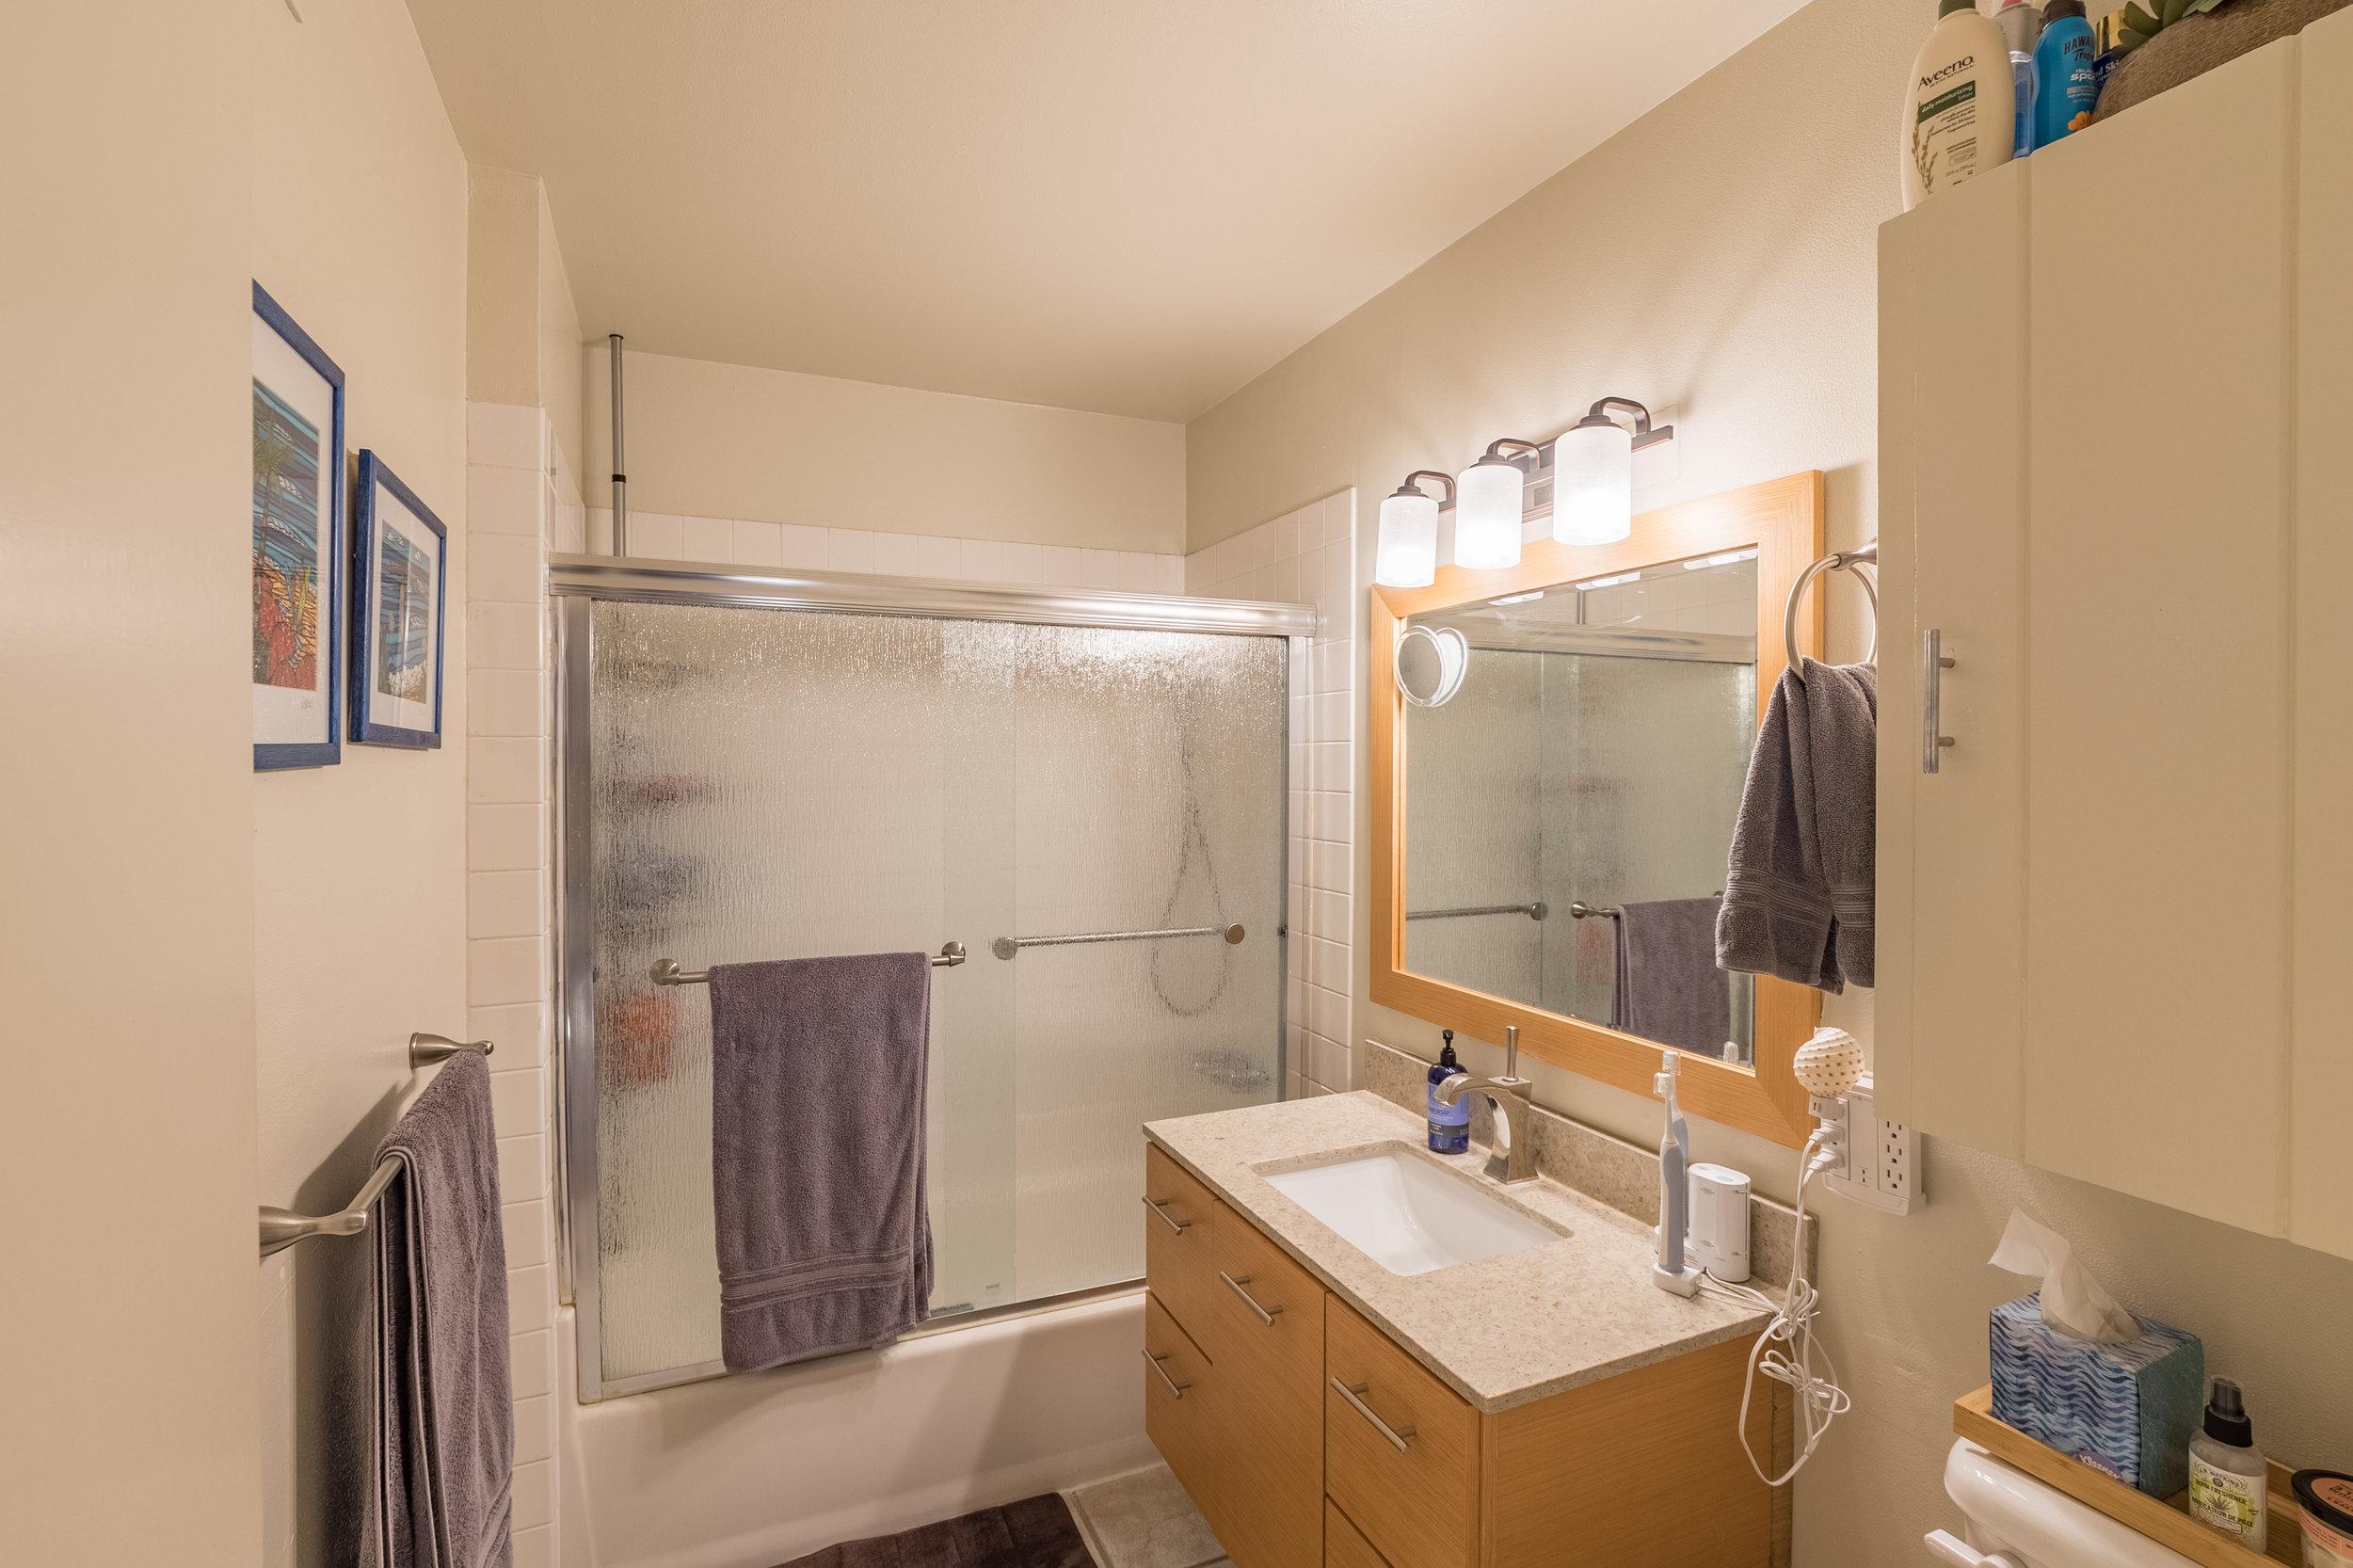 Bathroom in Capitola Duplex for Sale.jpg